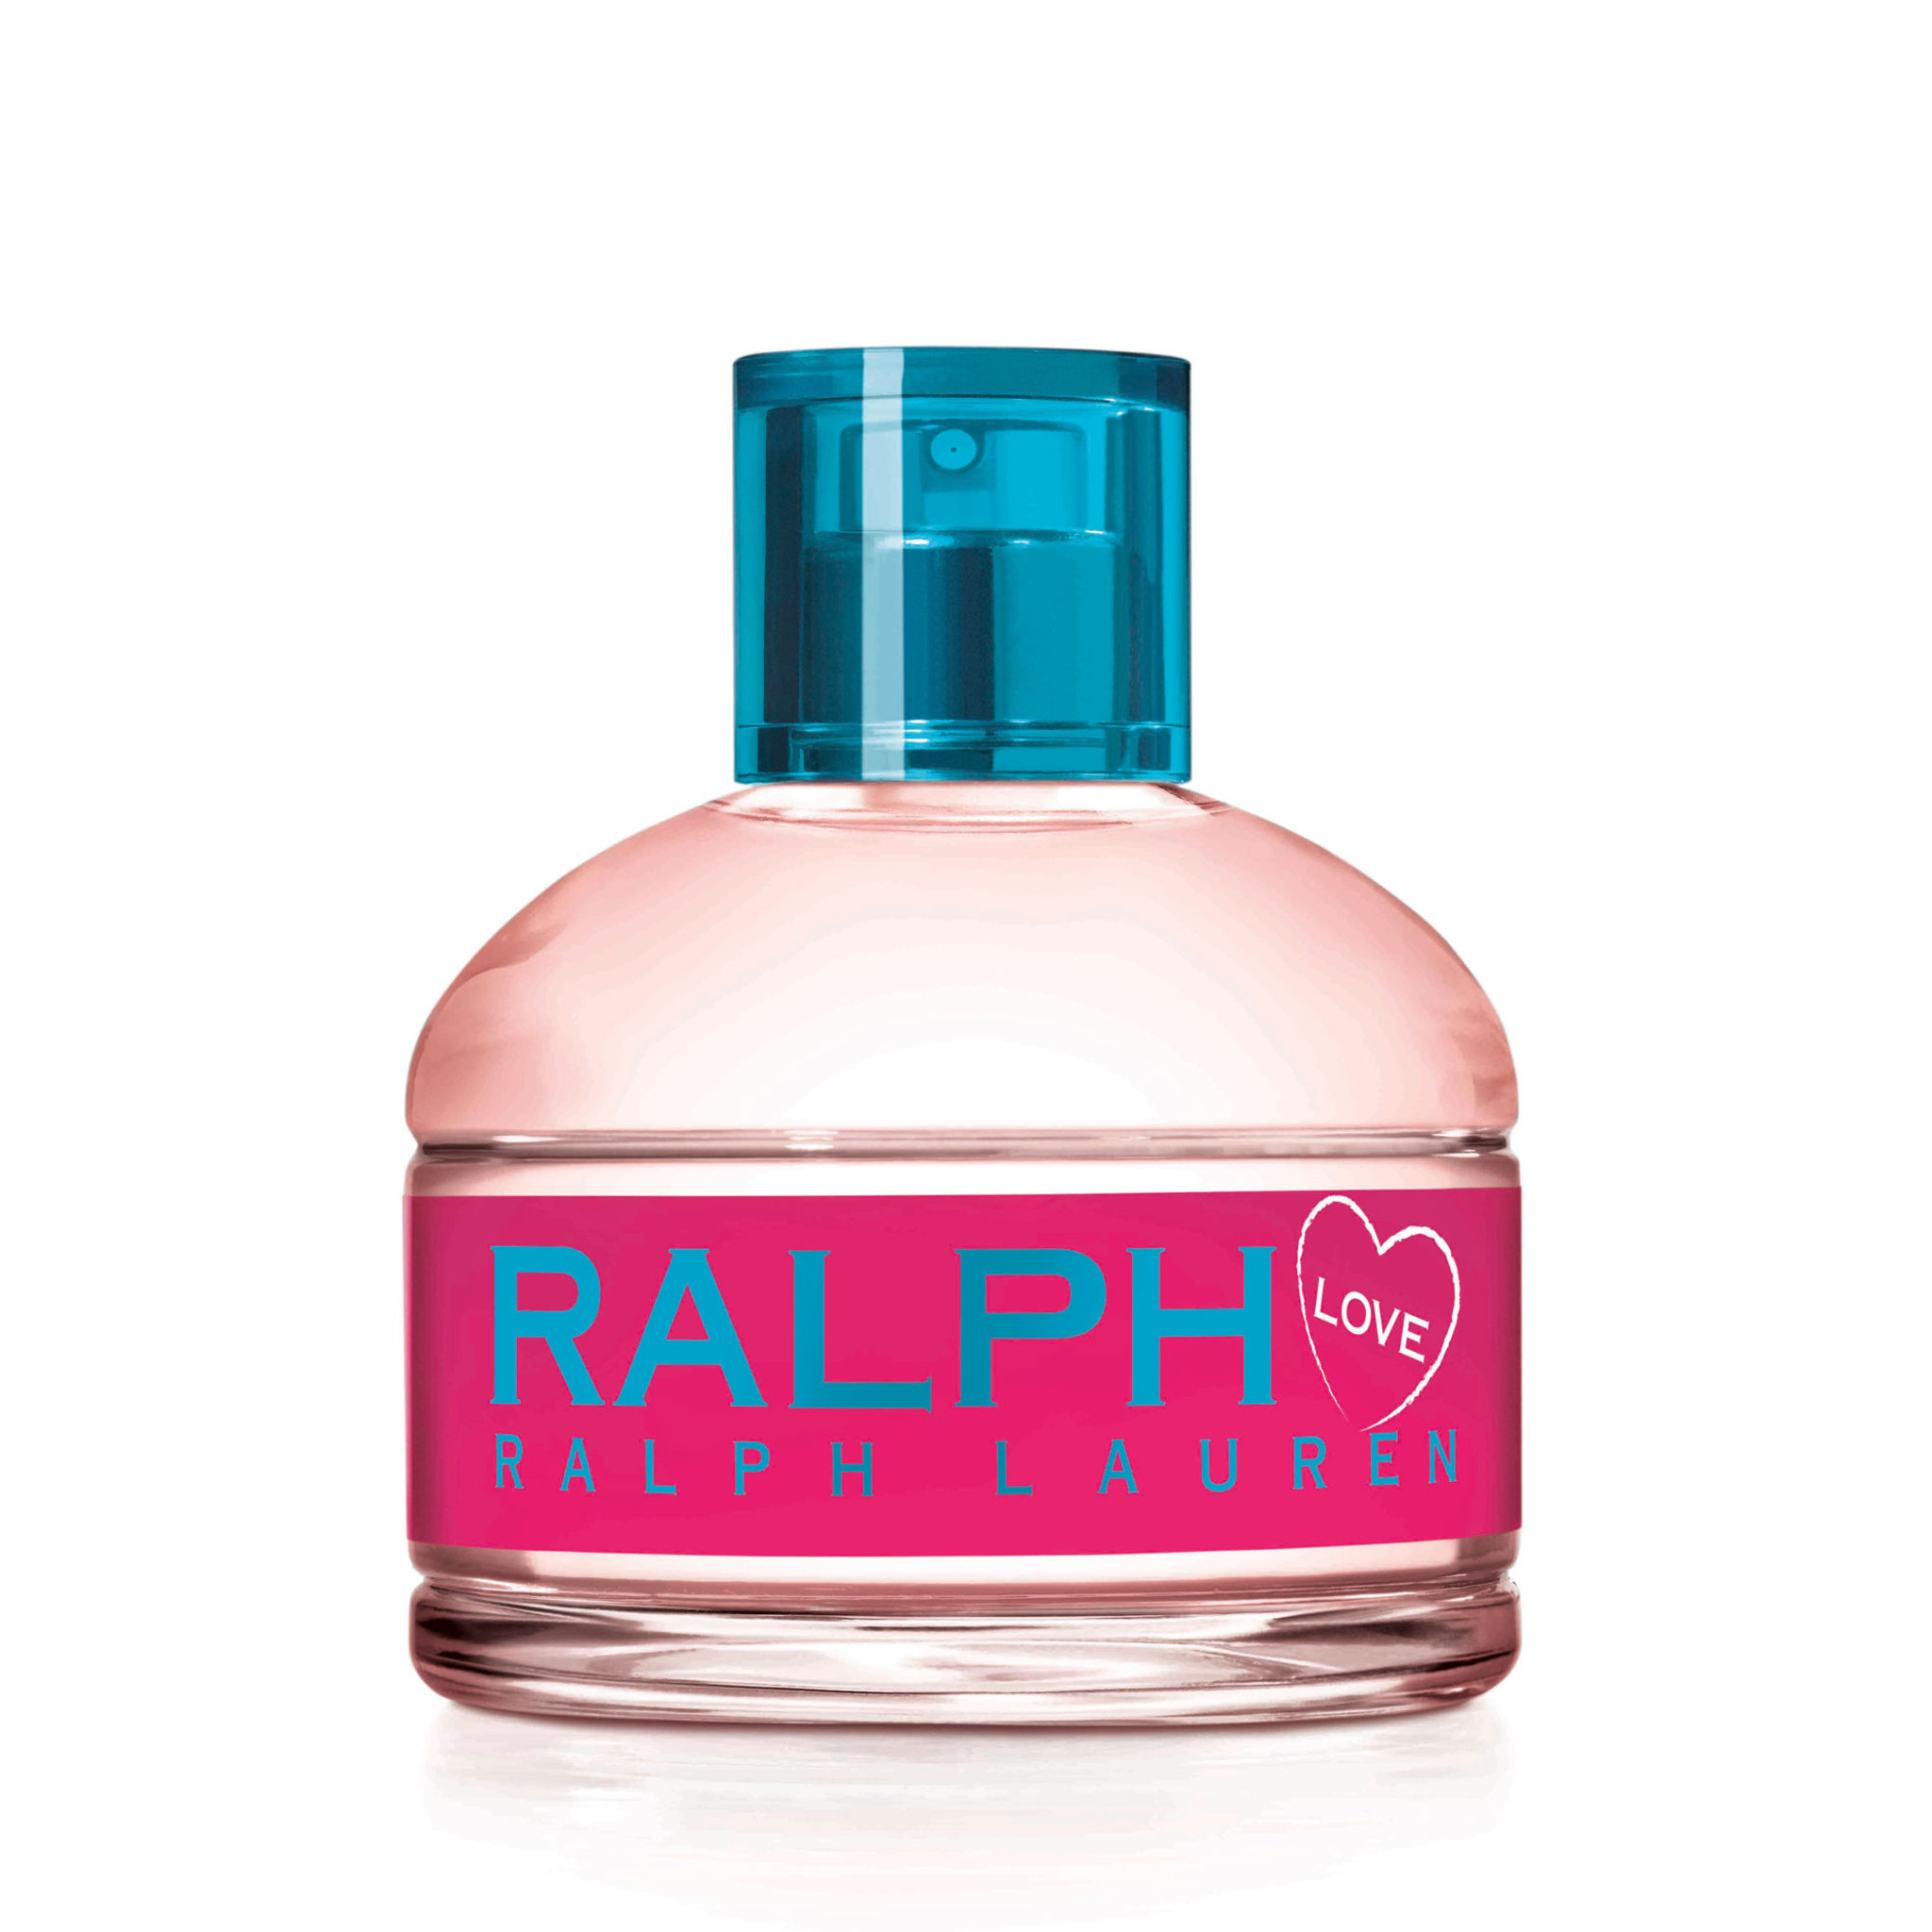 bra utseende överkomligt pris Storbritannien Ralph Lauren Ralph Love EdT, 30 ml - Parfym & EdT - Köp online på ...